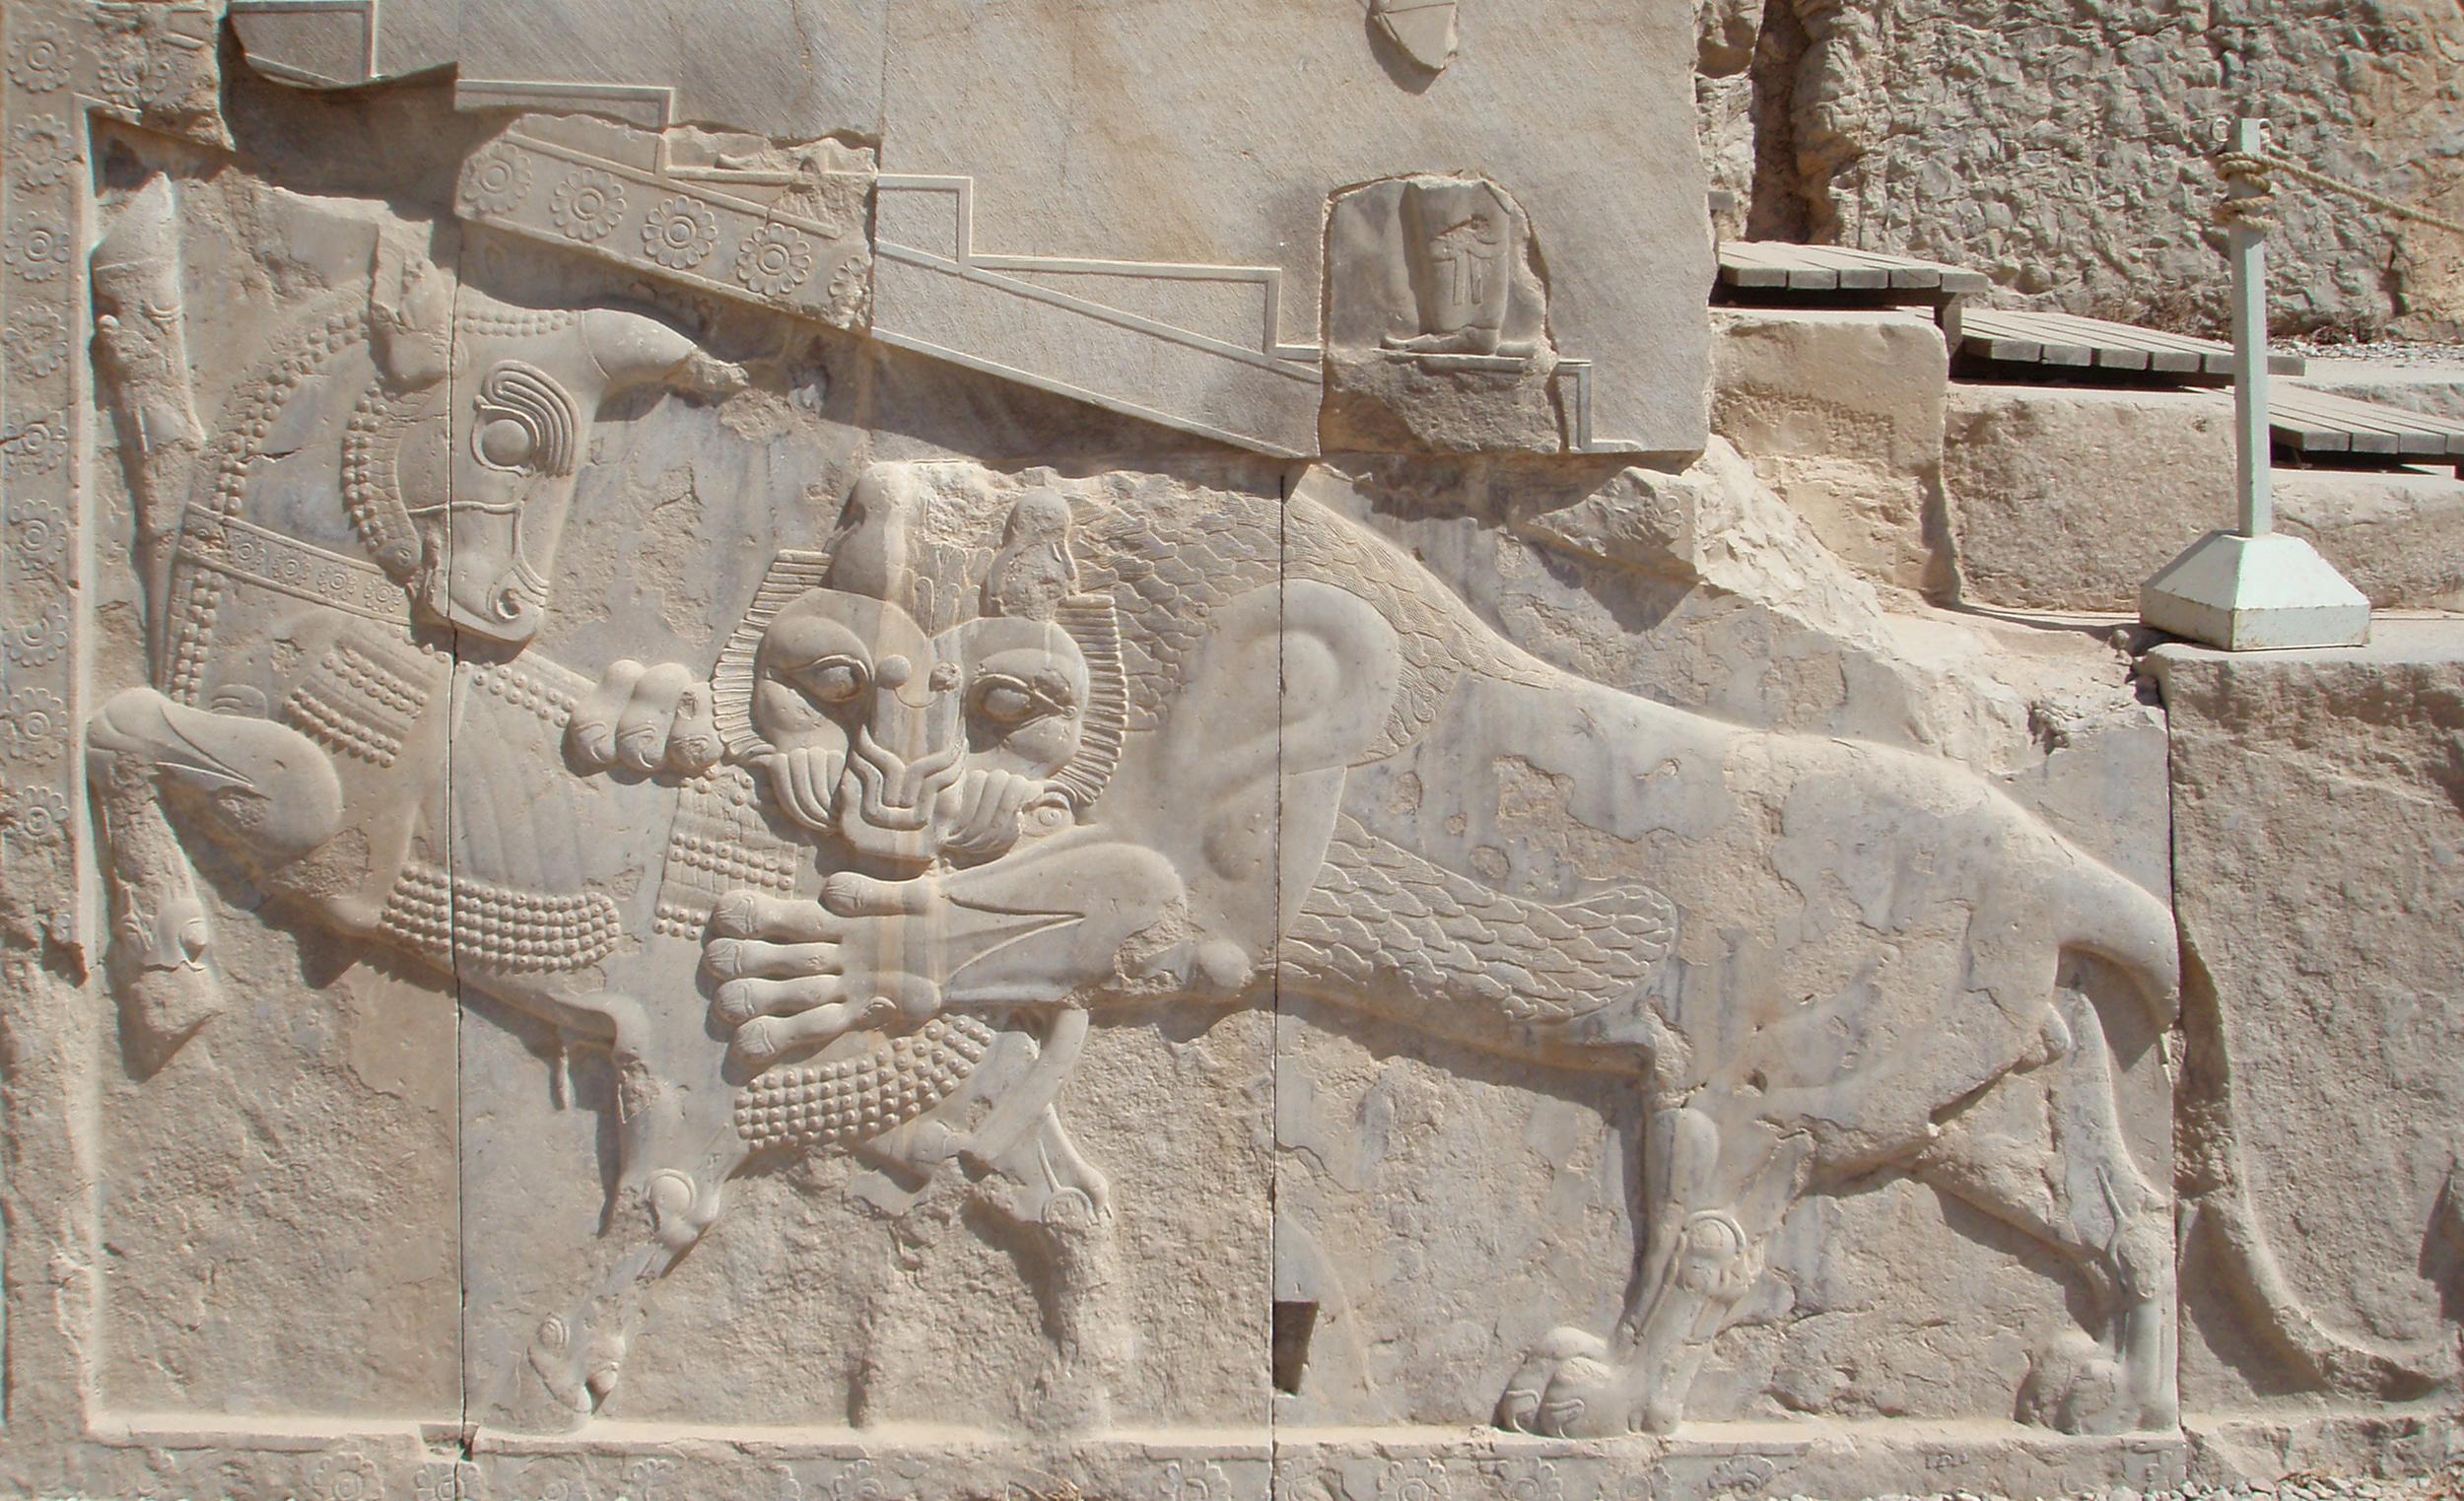 Vernal equinox nowruz 2015 the classical astrologer bas relief in persepolis fars province of iran a zoroastrian symbol of nowruz buycottarizona Choice Image